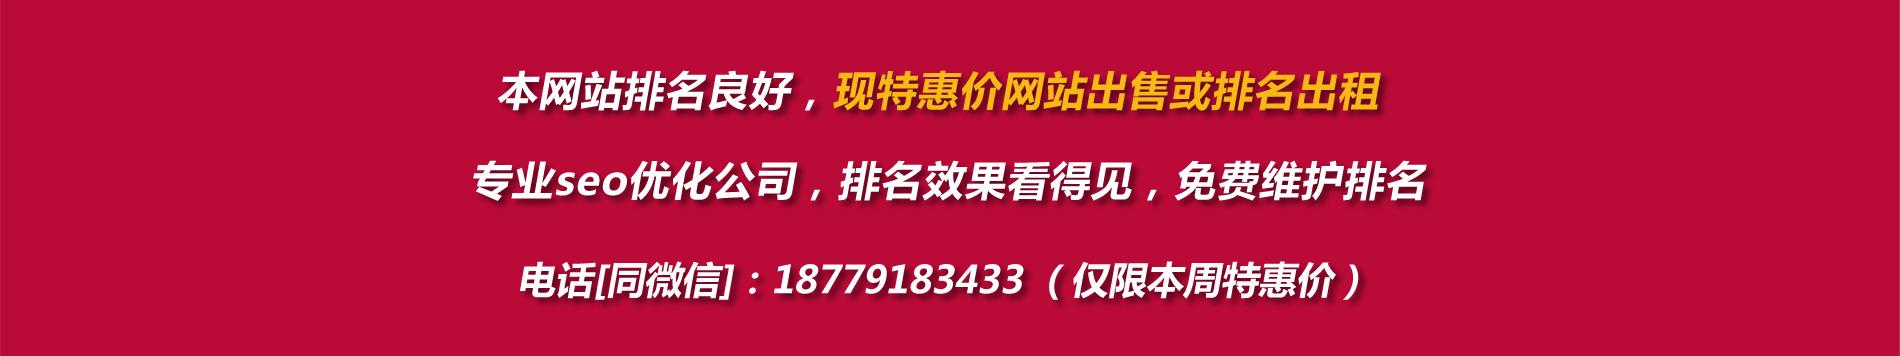 上海公司注册banner